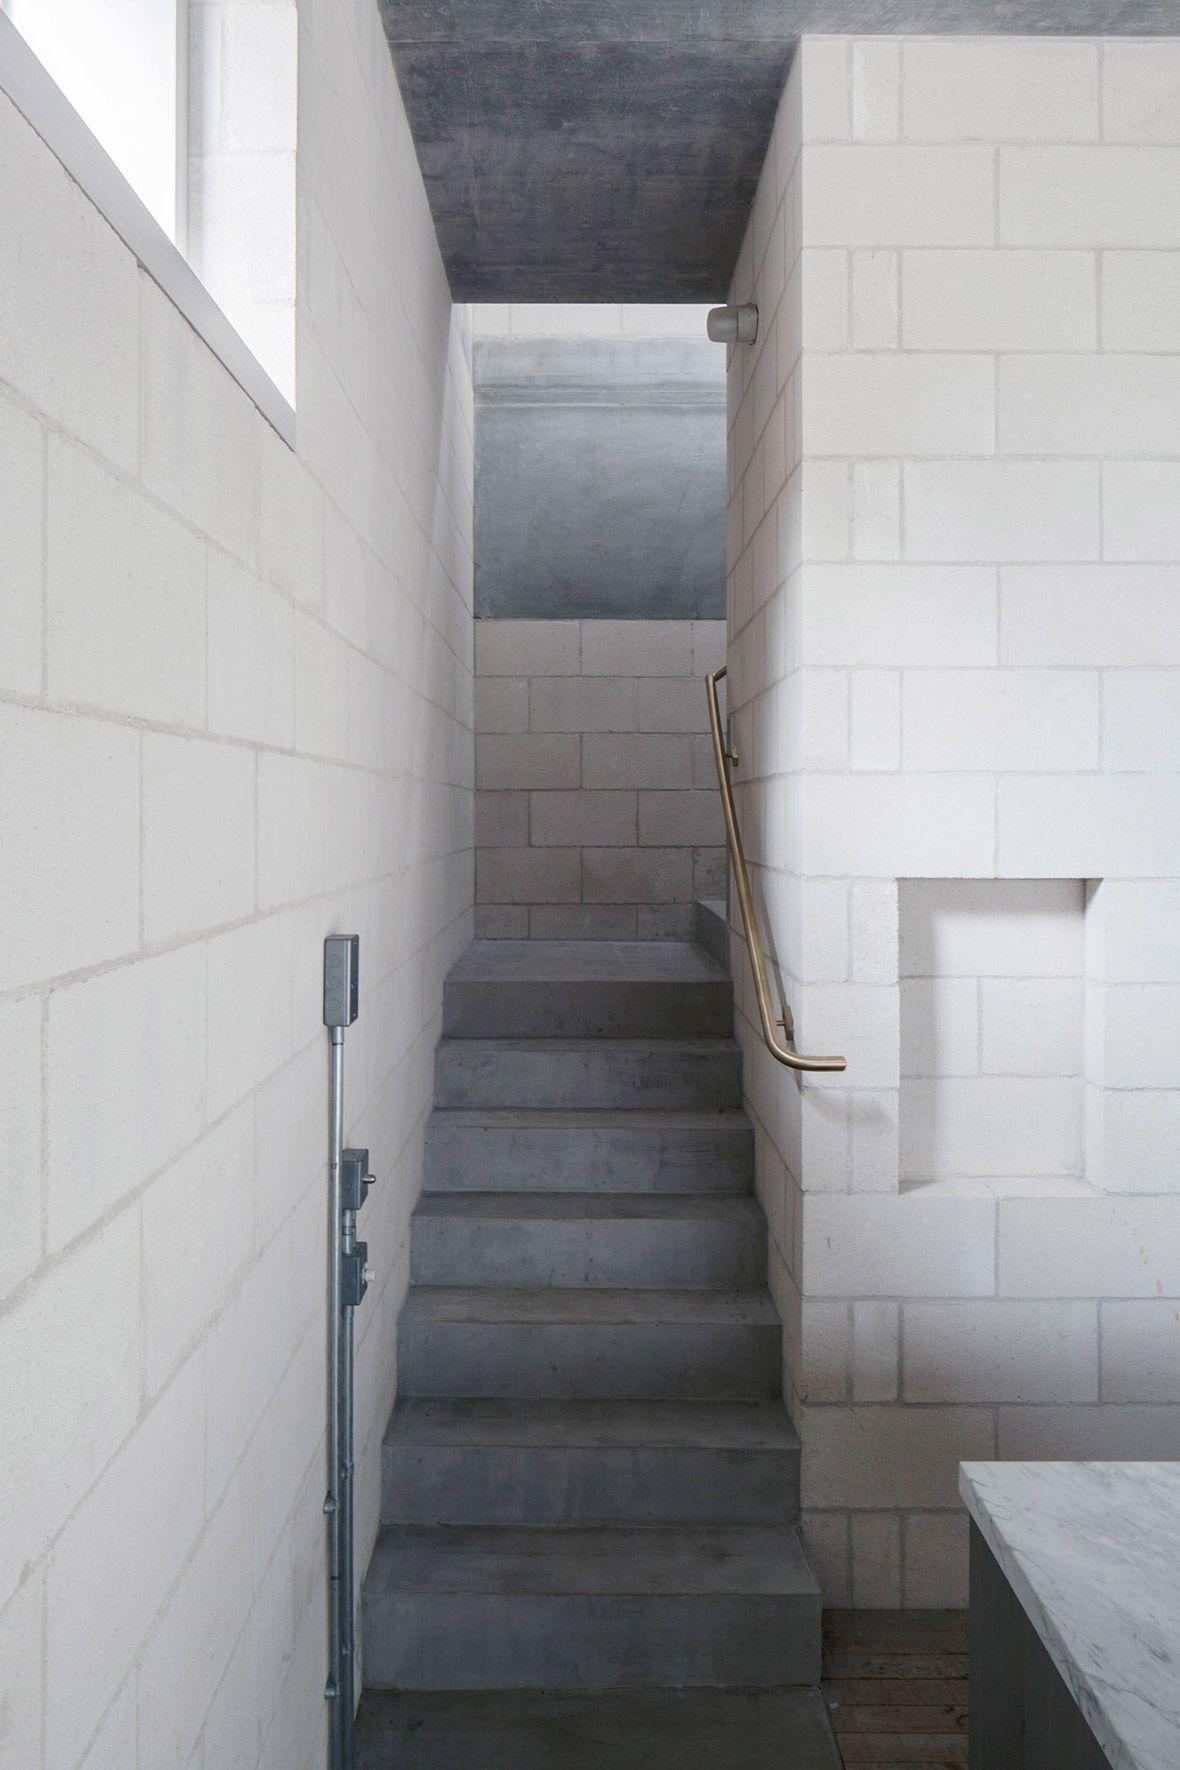 Juergen Teller Studio Architect Building Photography Minimalist Interior